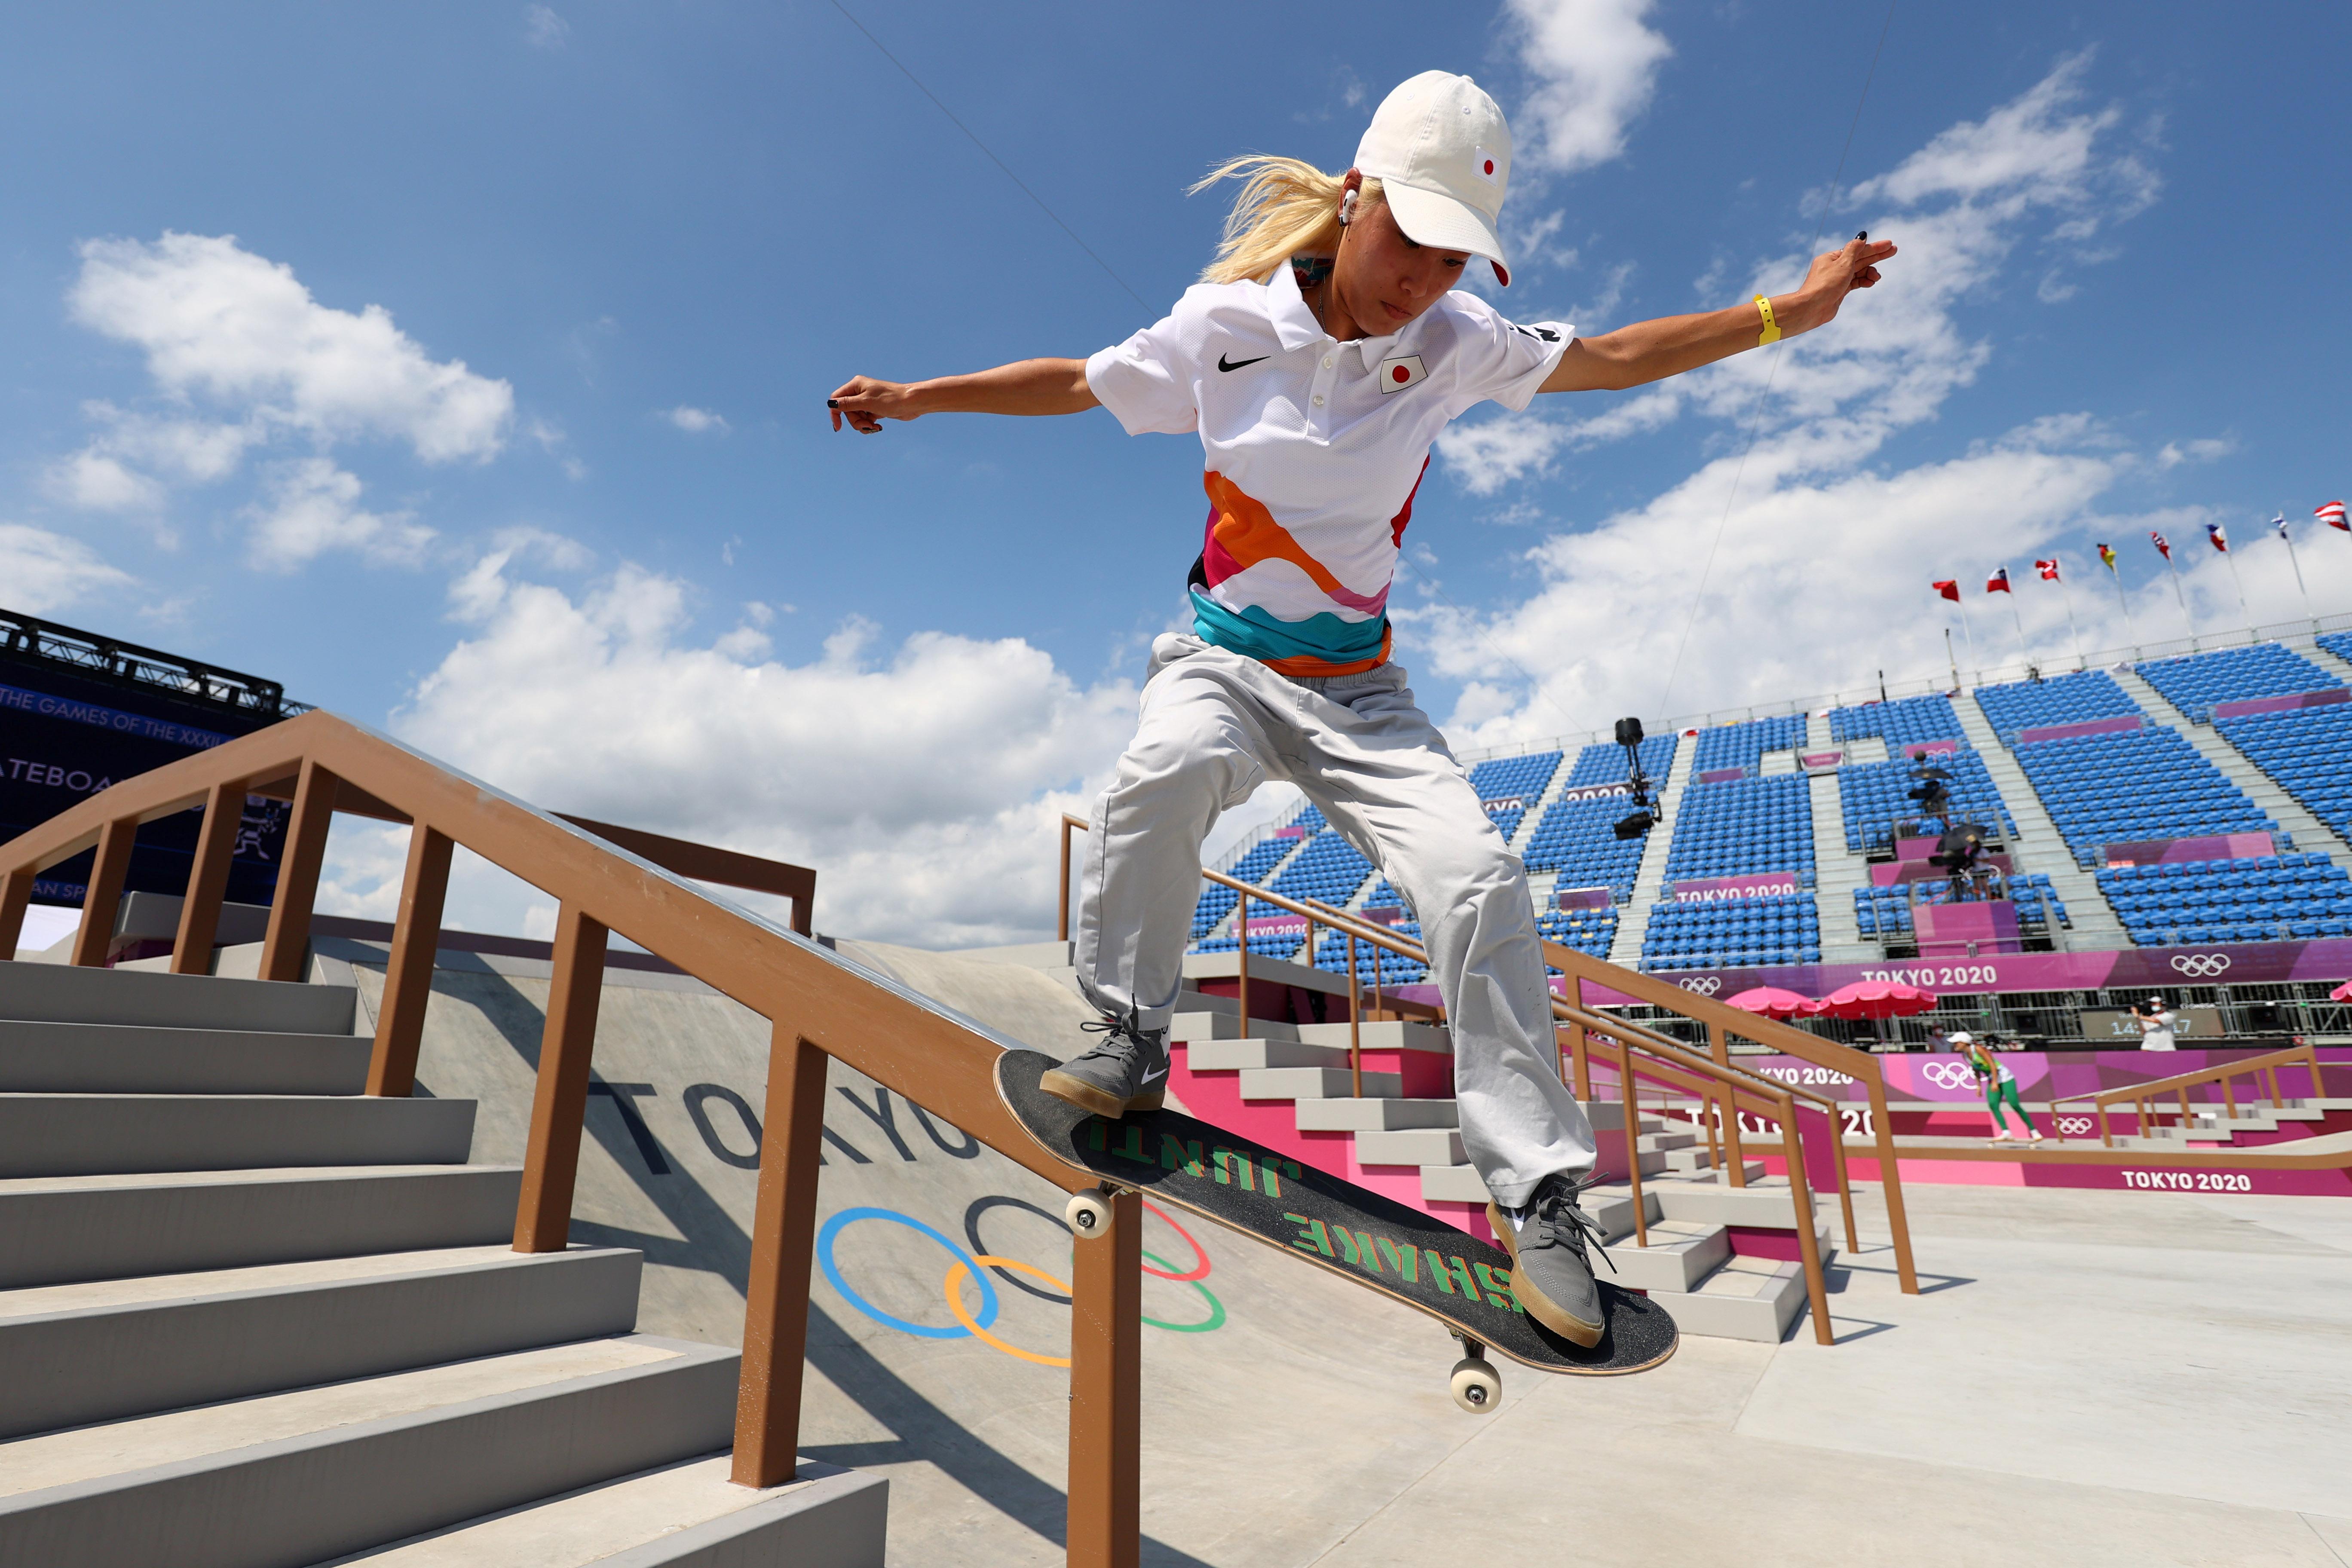 Tokyo 2020 Olympics - Skateboarding Training Session - Ariake Urban Sports Park, Tokyo, Japan - July 24, 2021. Aori Nishimura of Japan in action during training. REUTERS/Lucy Nicholson